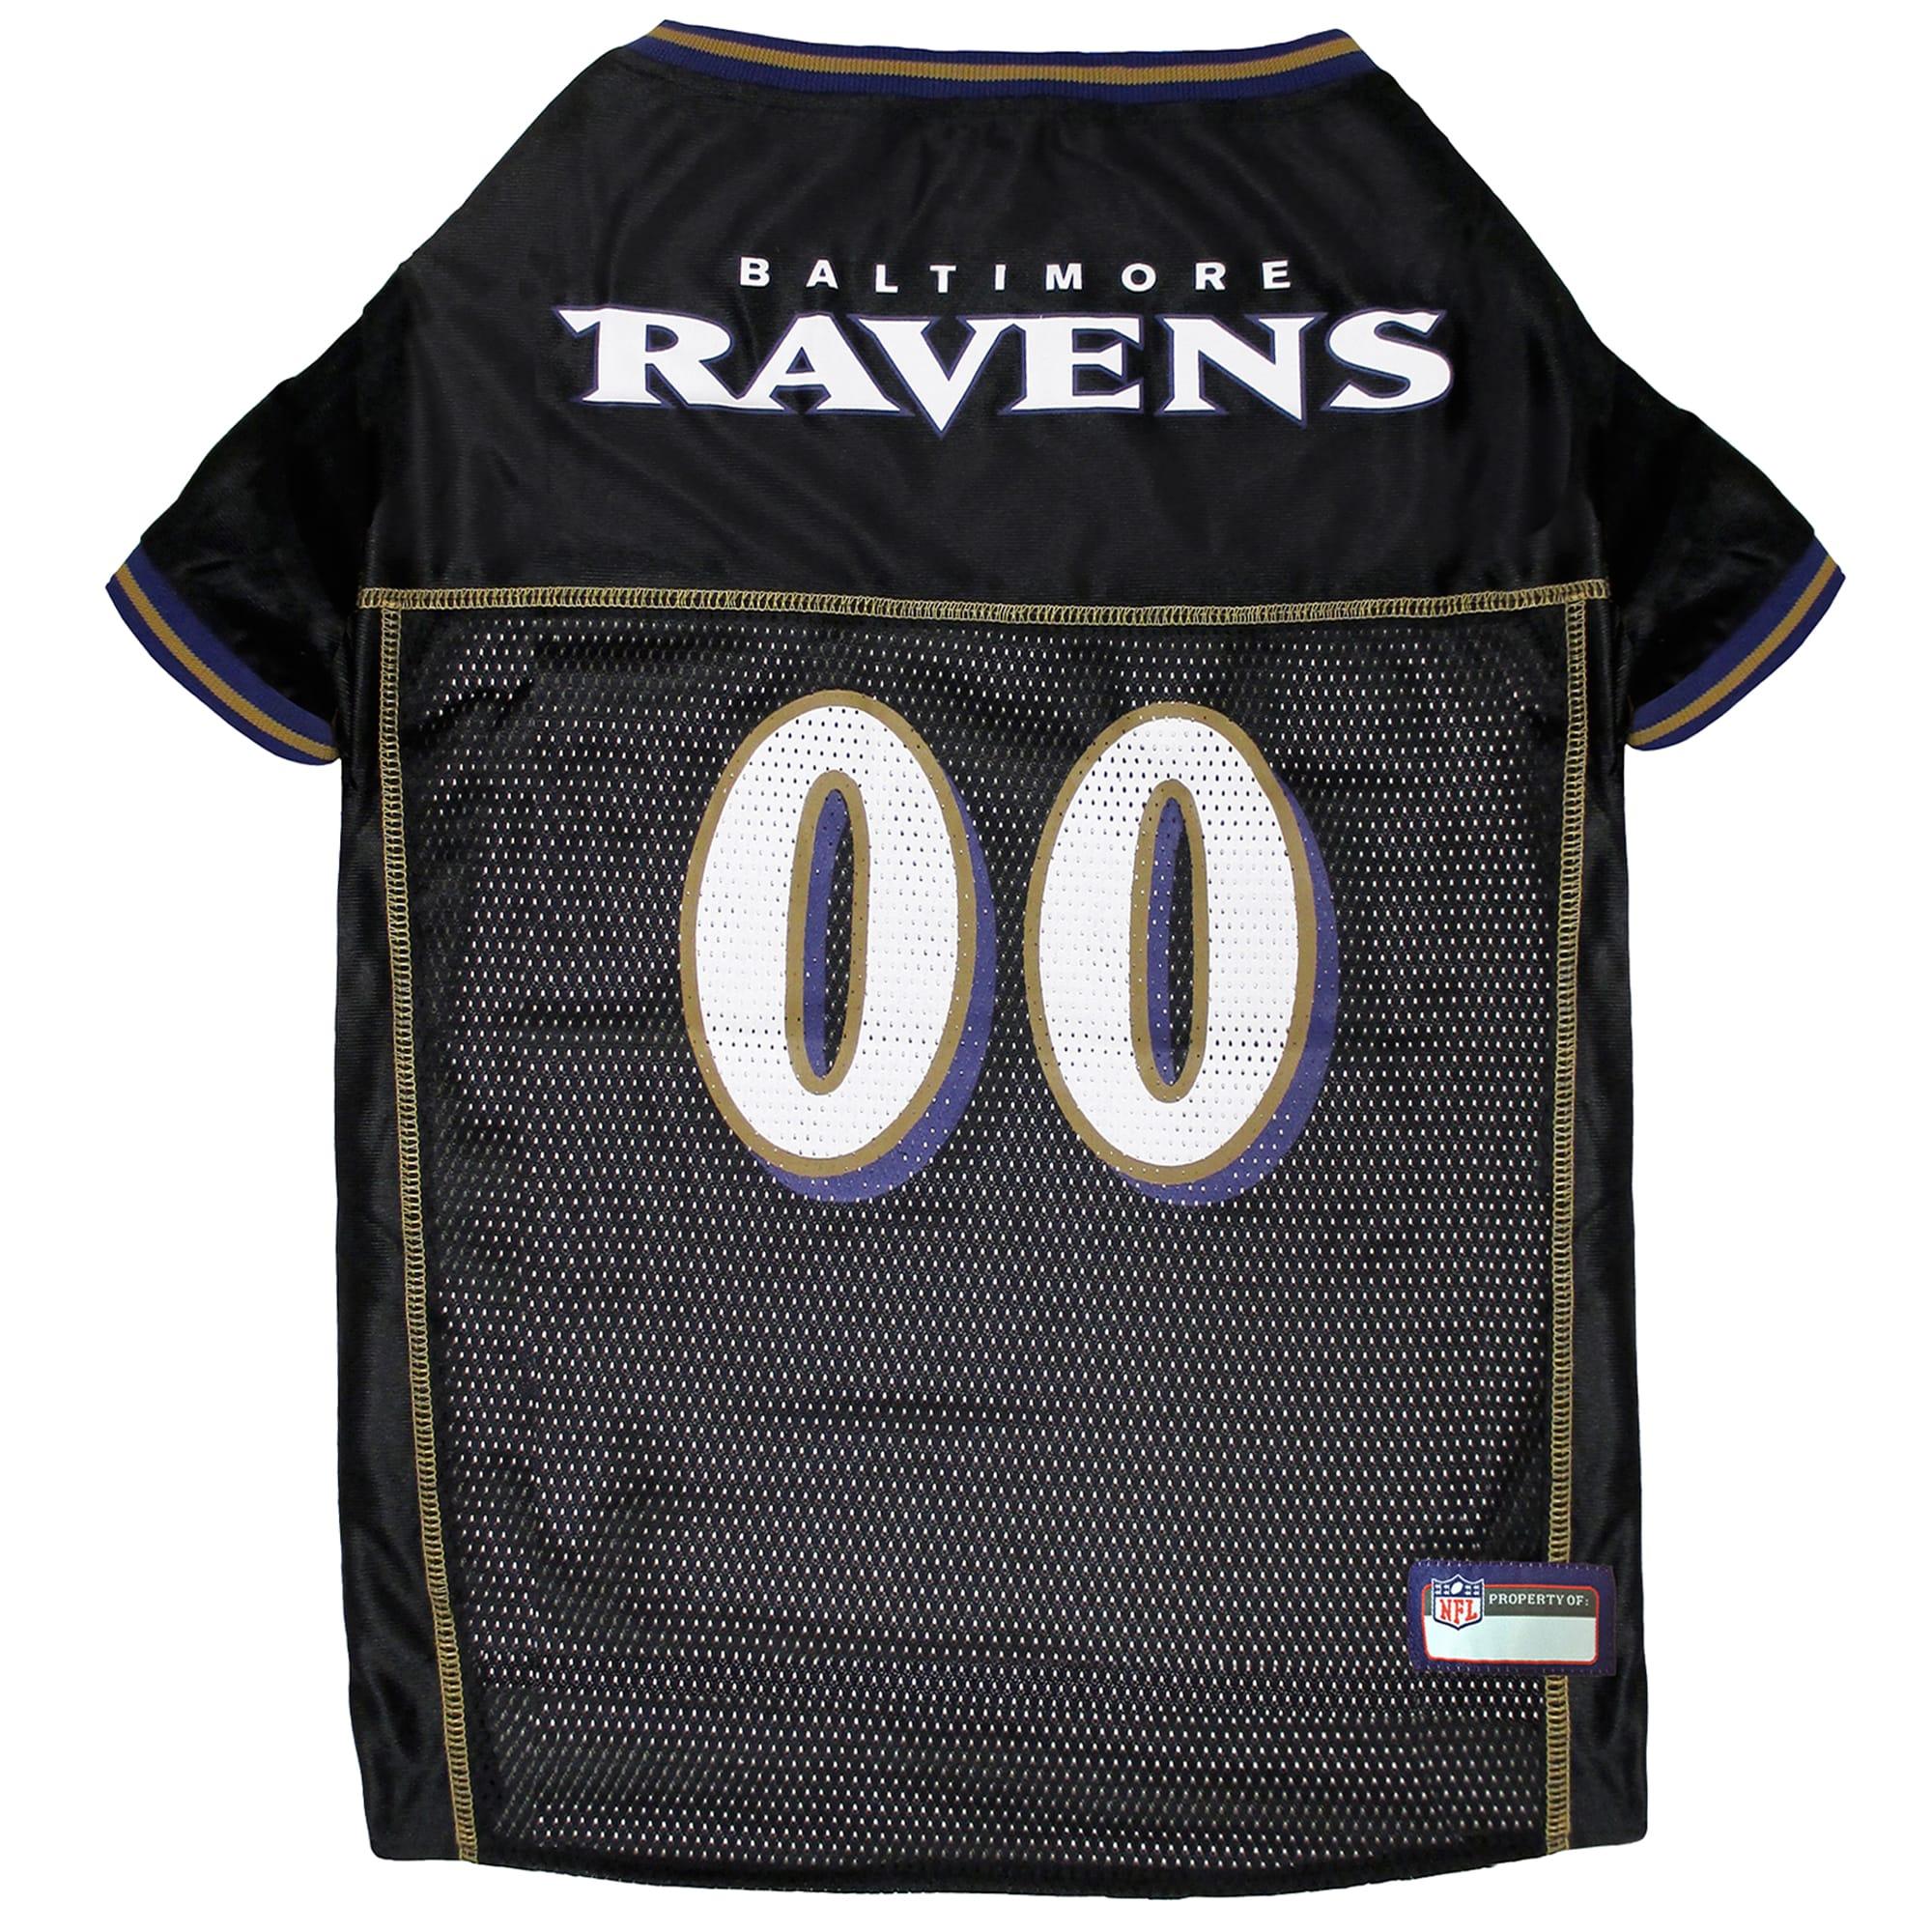 Pets First Baltimore Ravens NFL Mesh Pet Jersey, X-Small